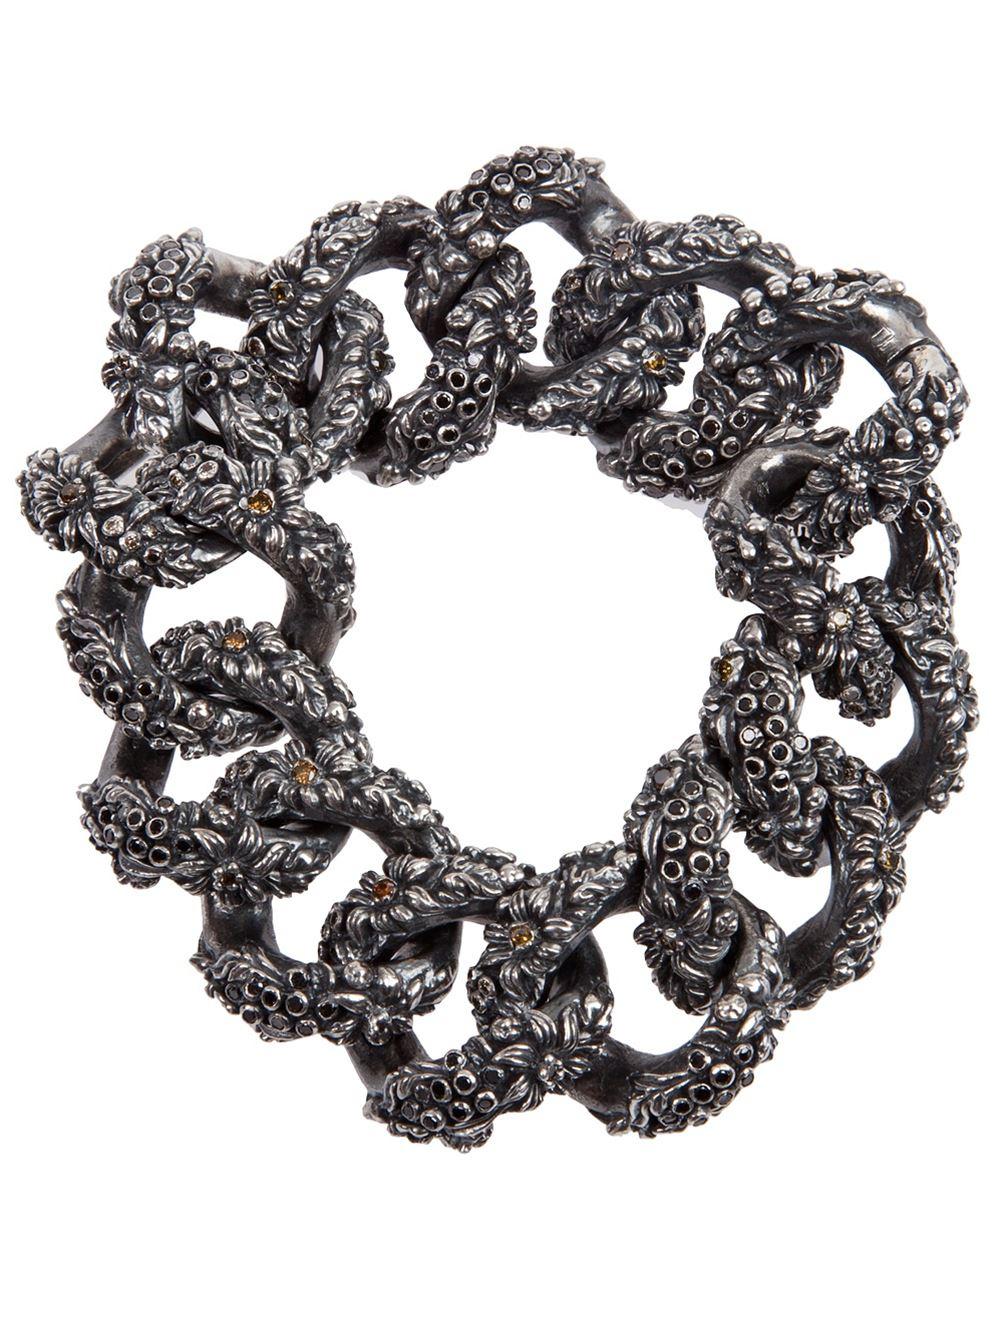 Bratara din argint cu diamante, Ugo Cacciatori, shop.leclaireur.com, 6.500 euro